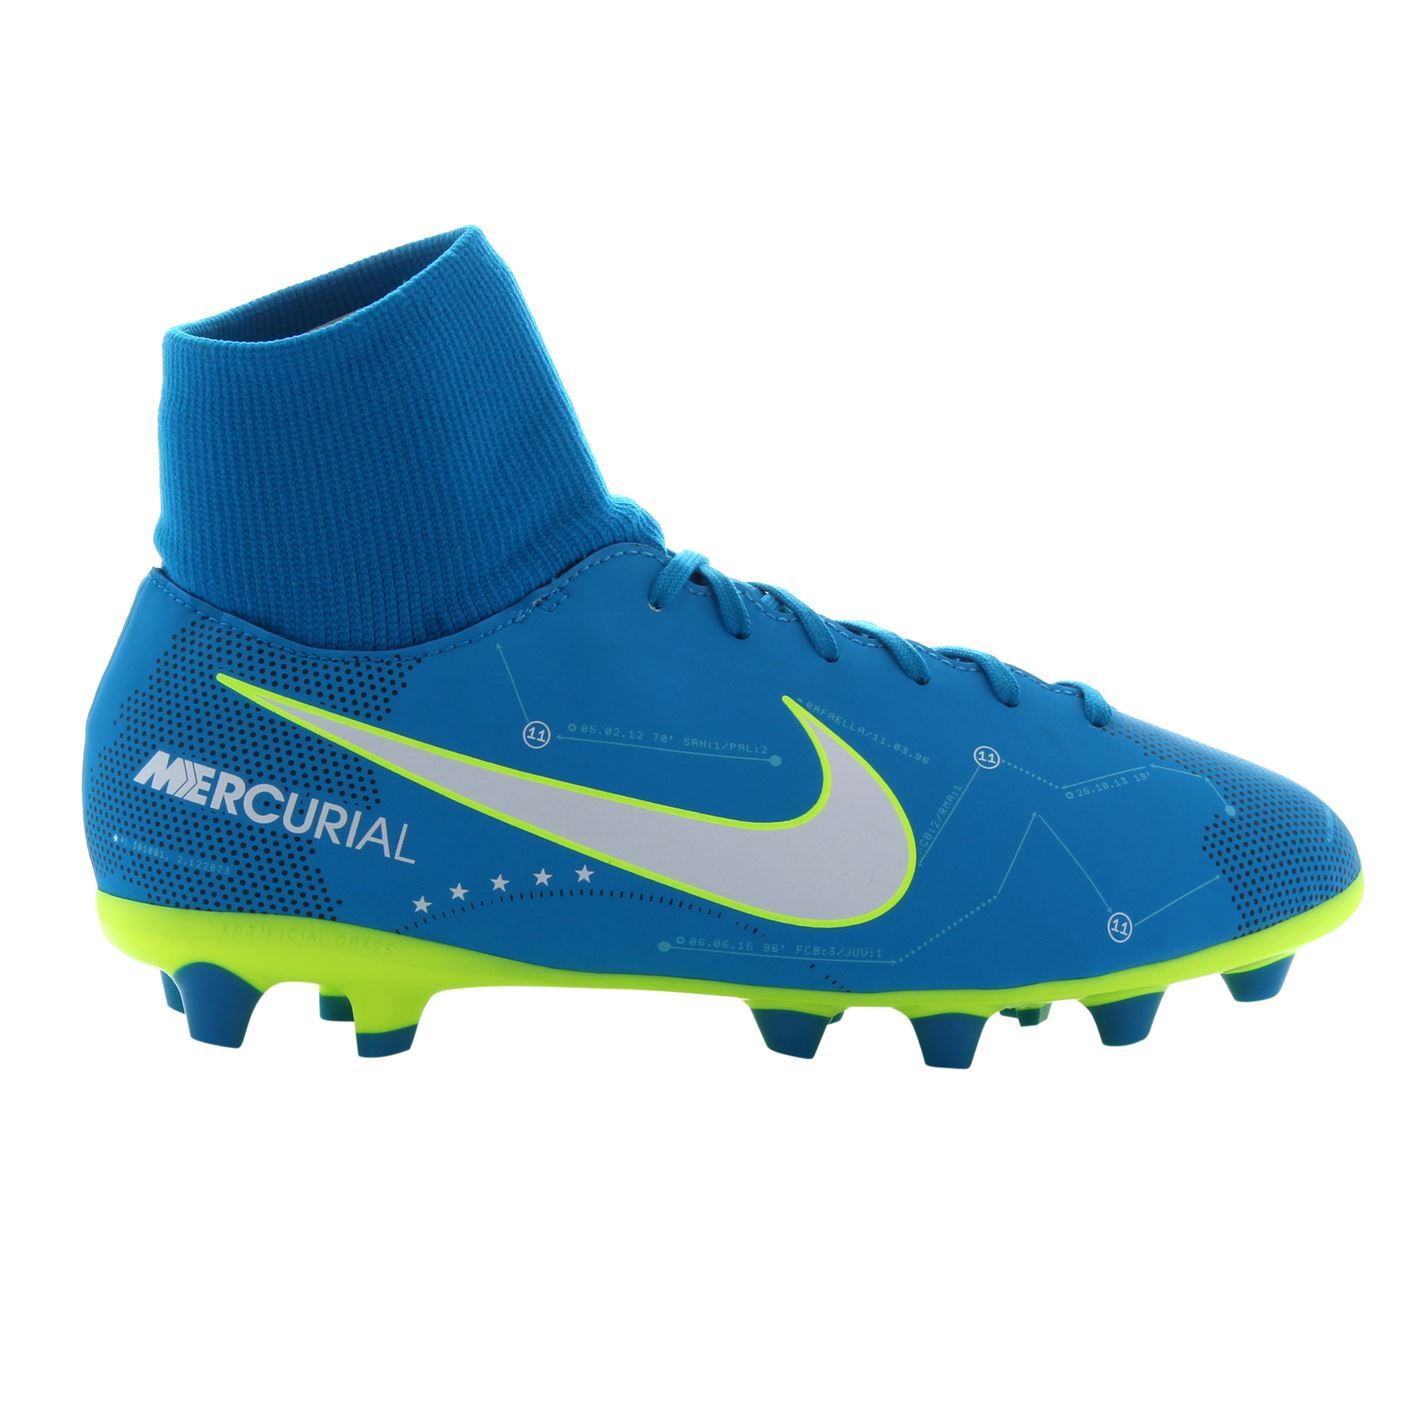 scarpe da calcio nike neymar